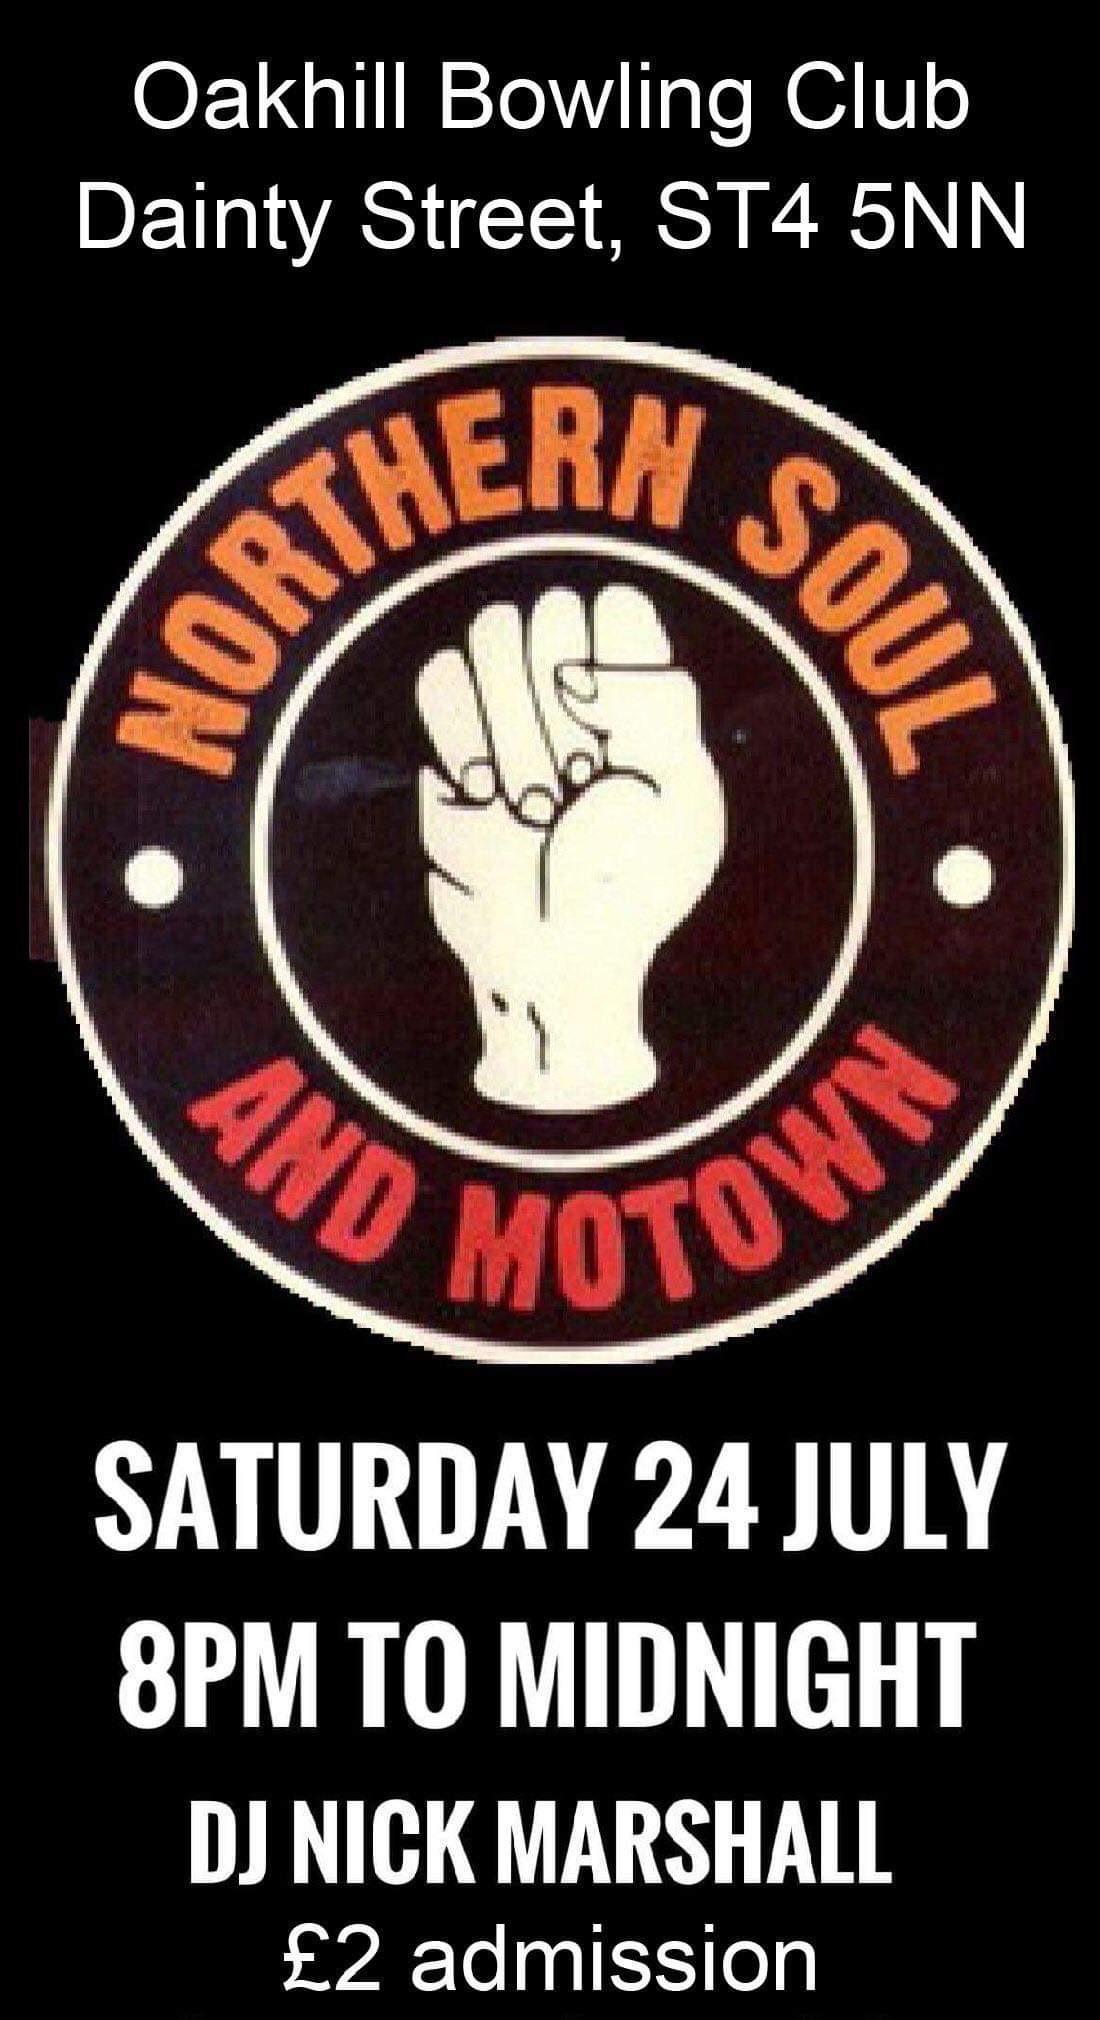 Oakhill Bowling Club Soul And Motown Night flyer